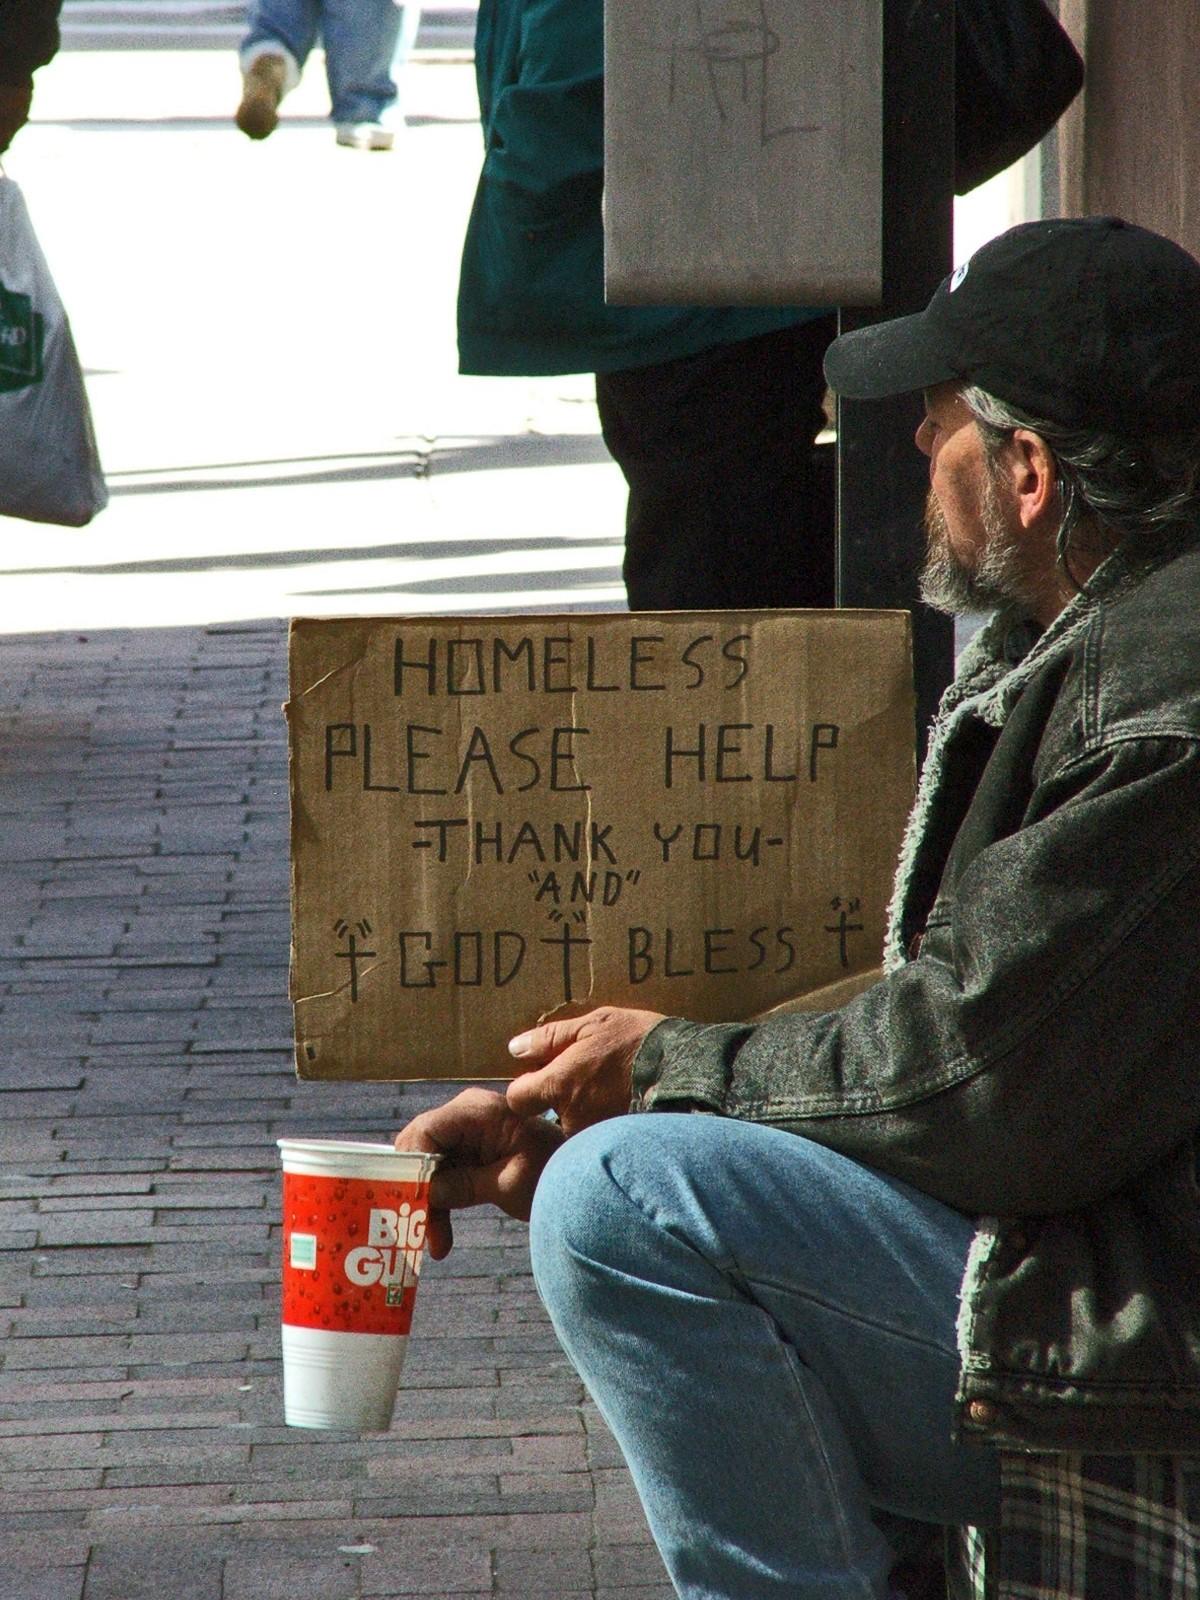 tale of 2 beggars